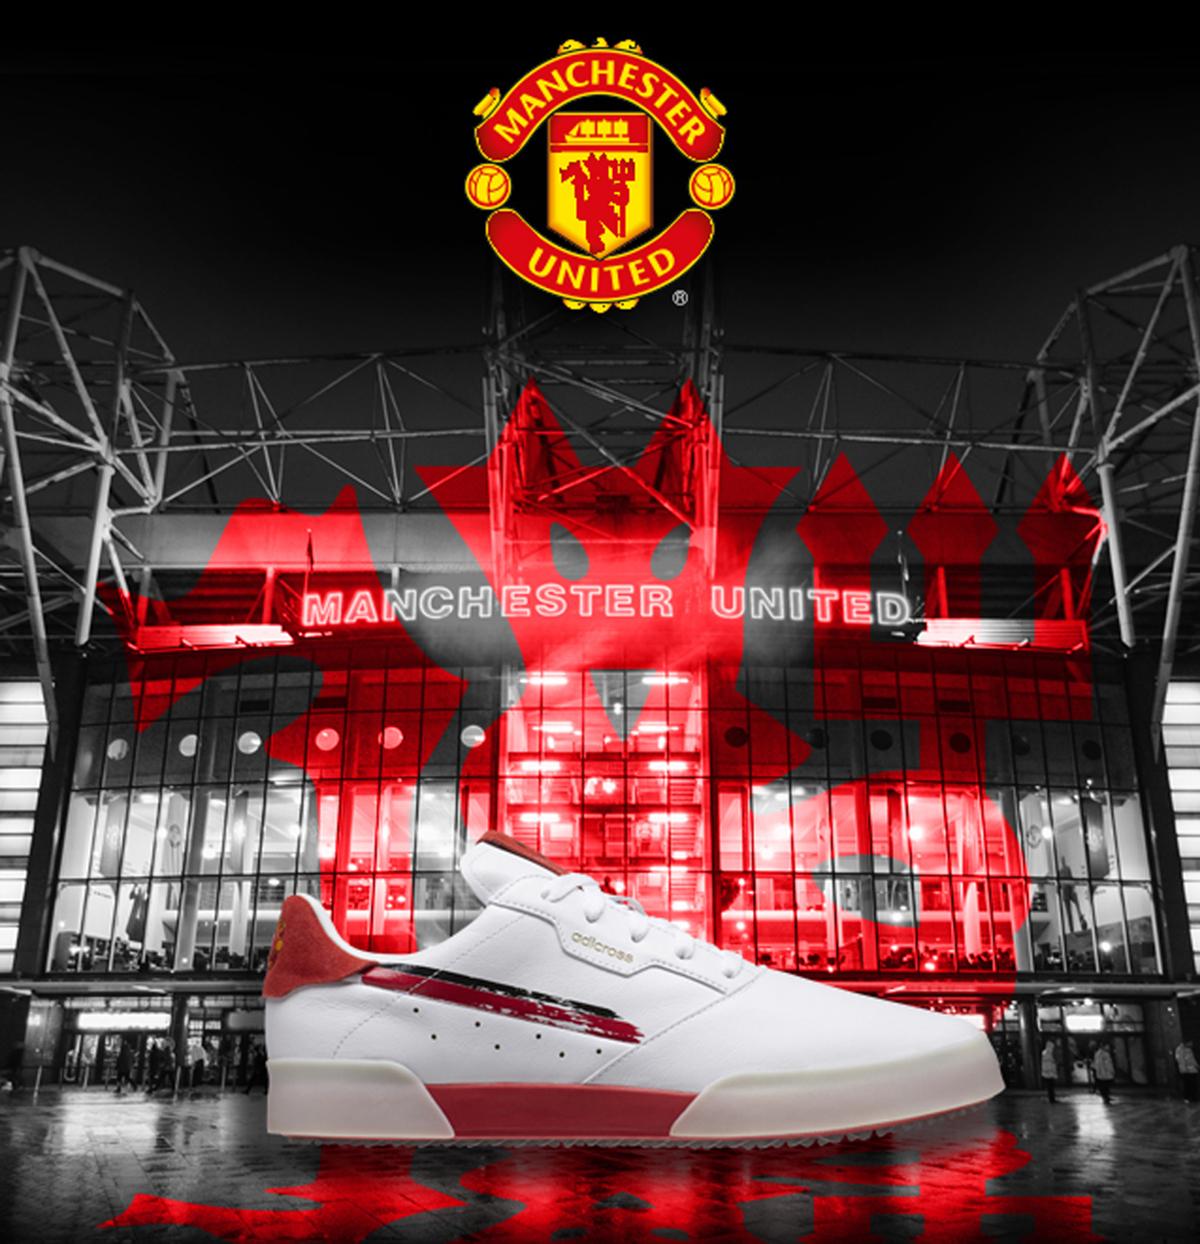 Manchester United x adidas Golf